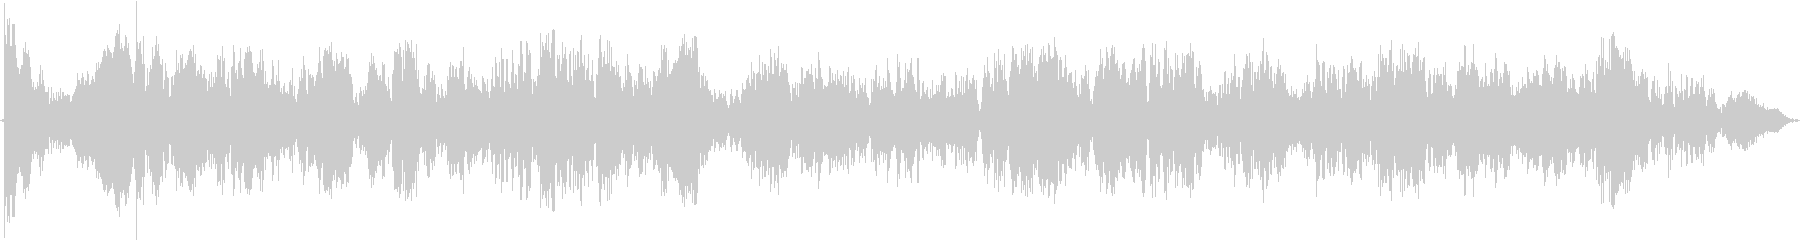 SciFi EC03_96_1の未再生の波形